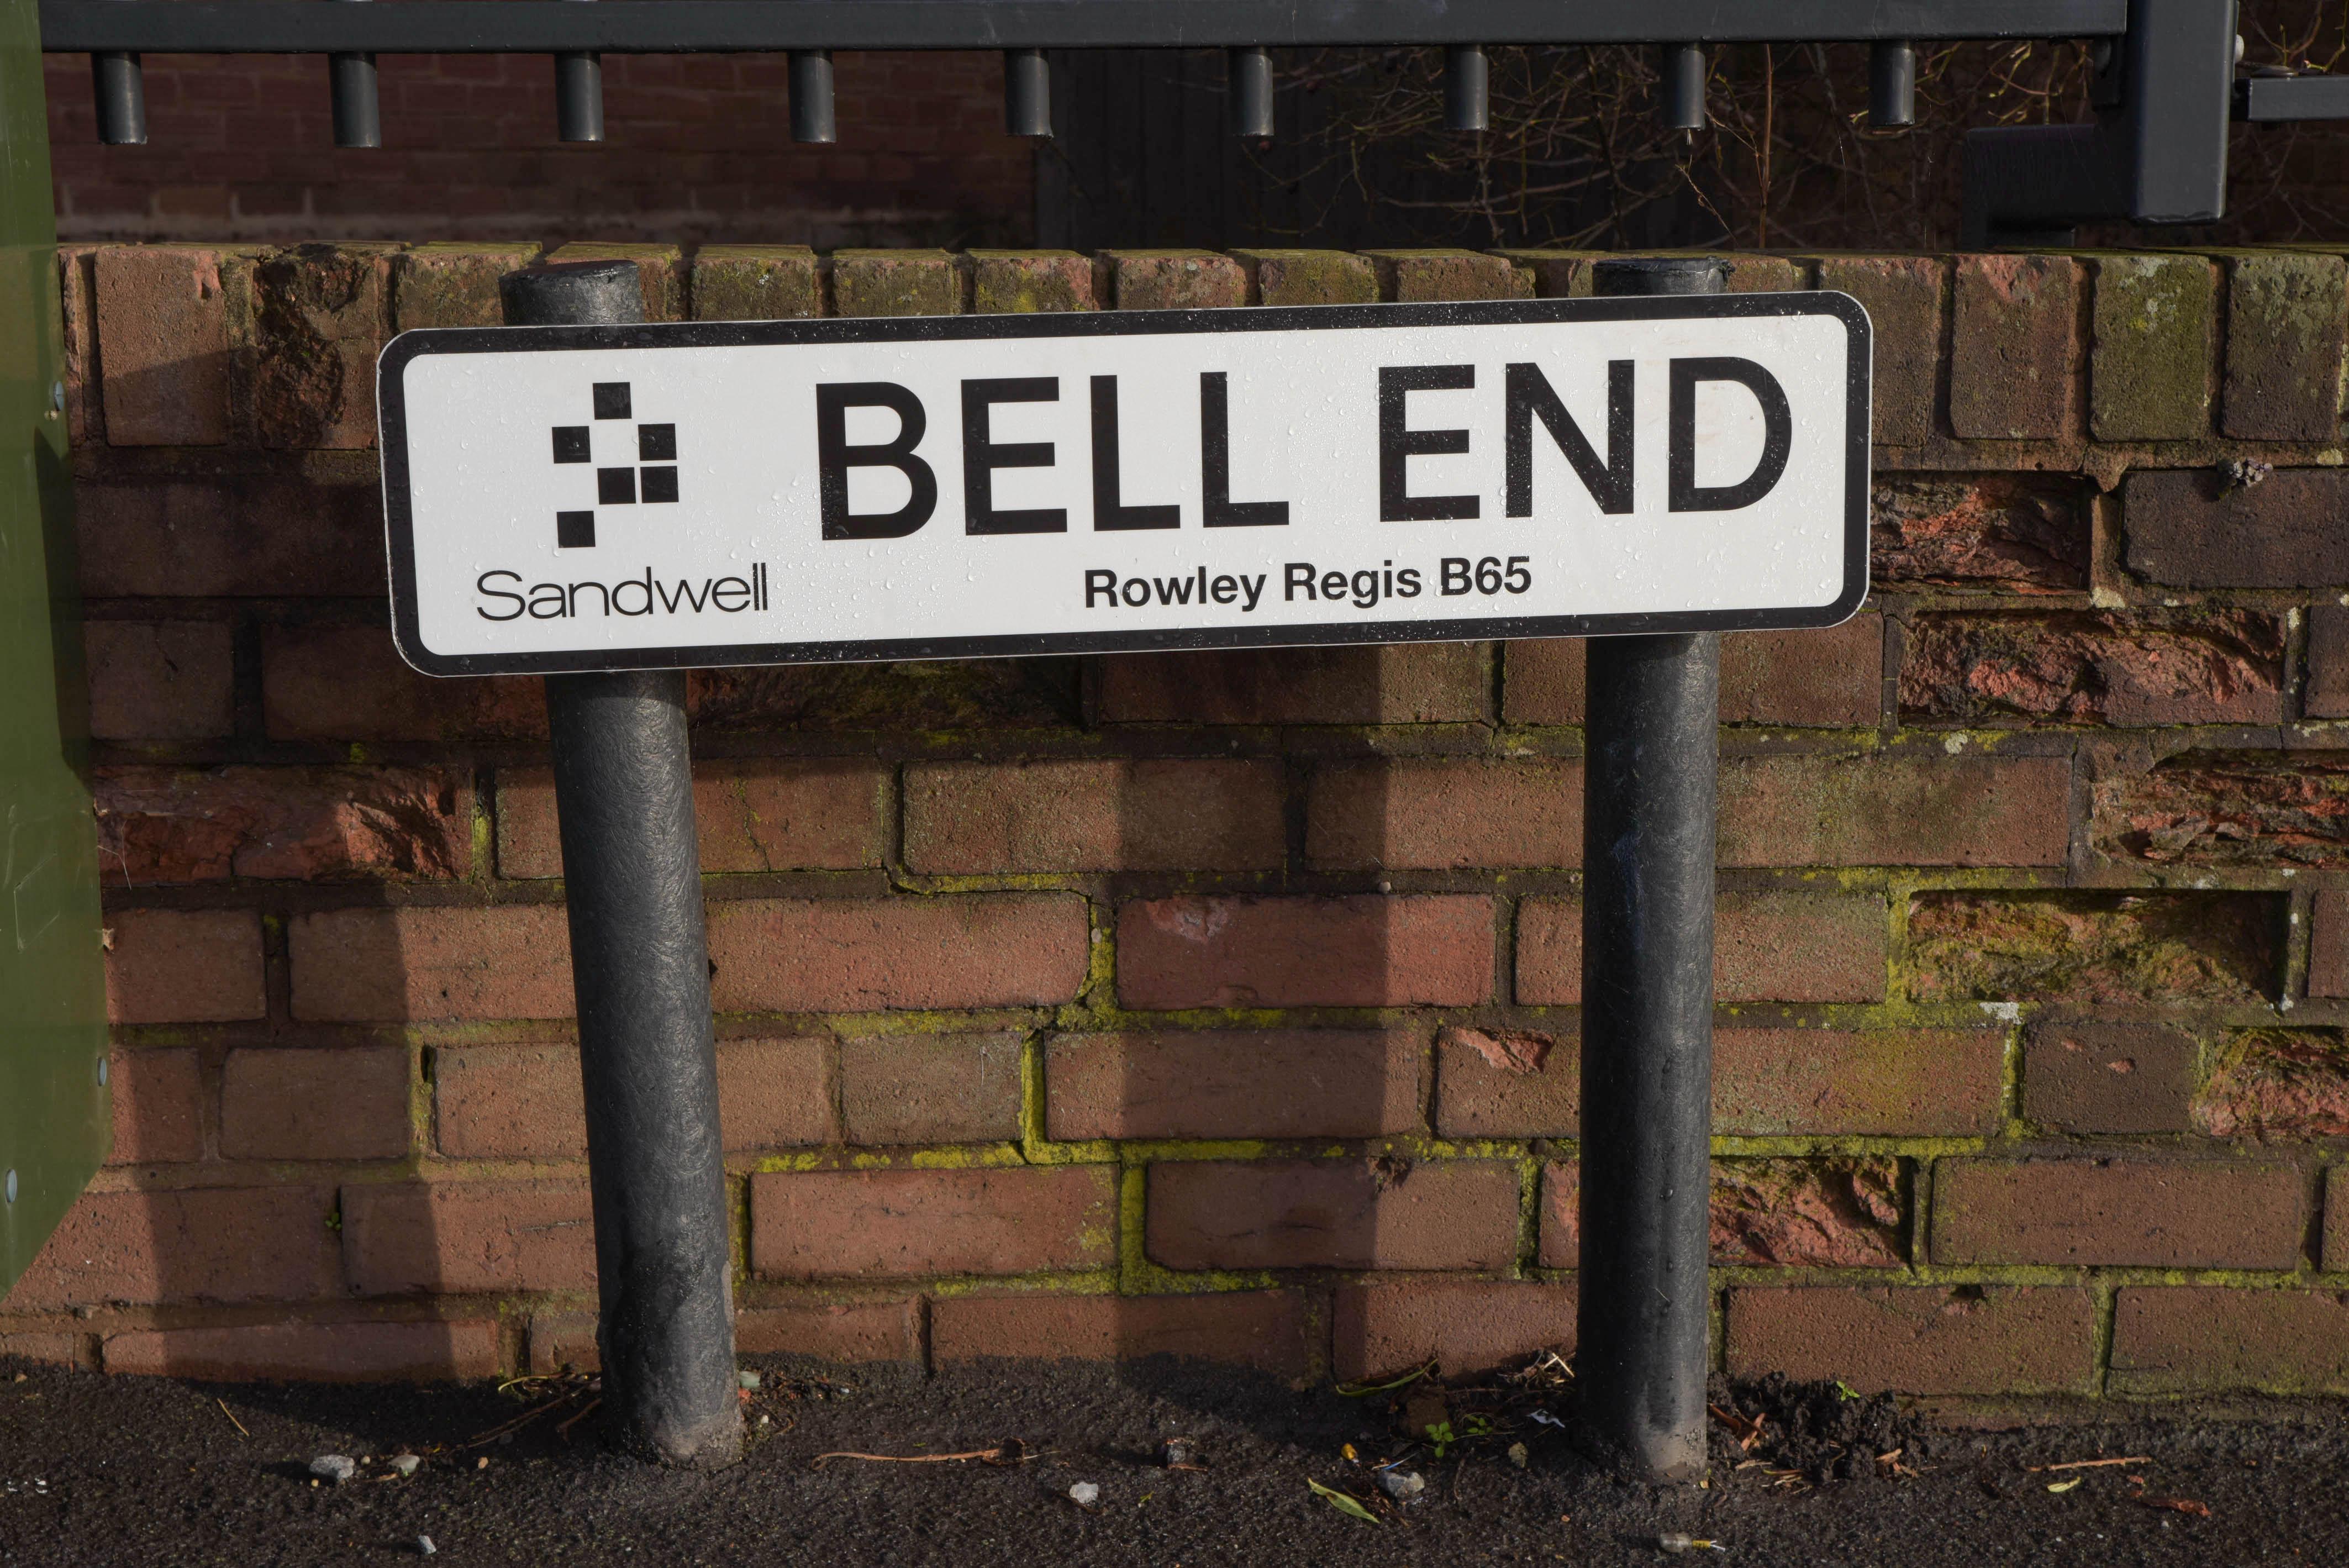 Bell End in Rowley Regis. Credit: Caters